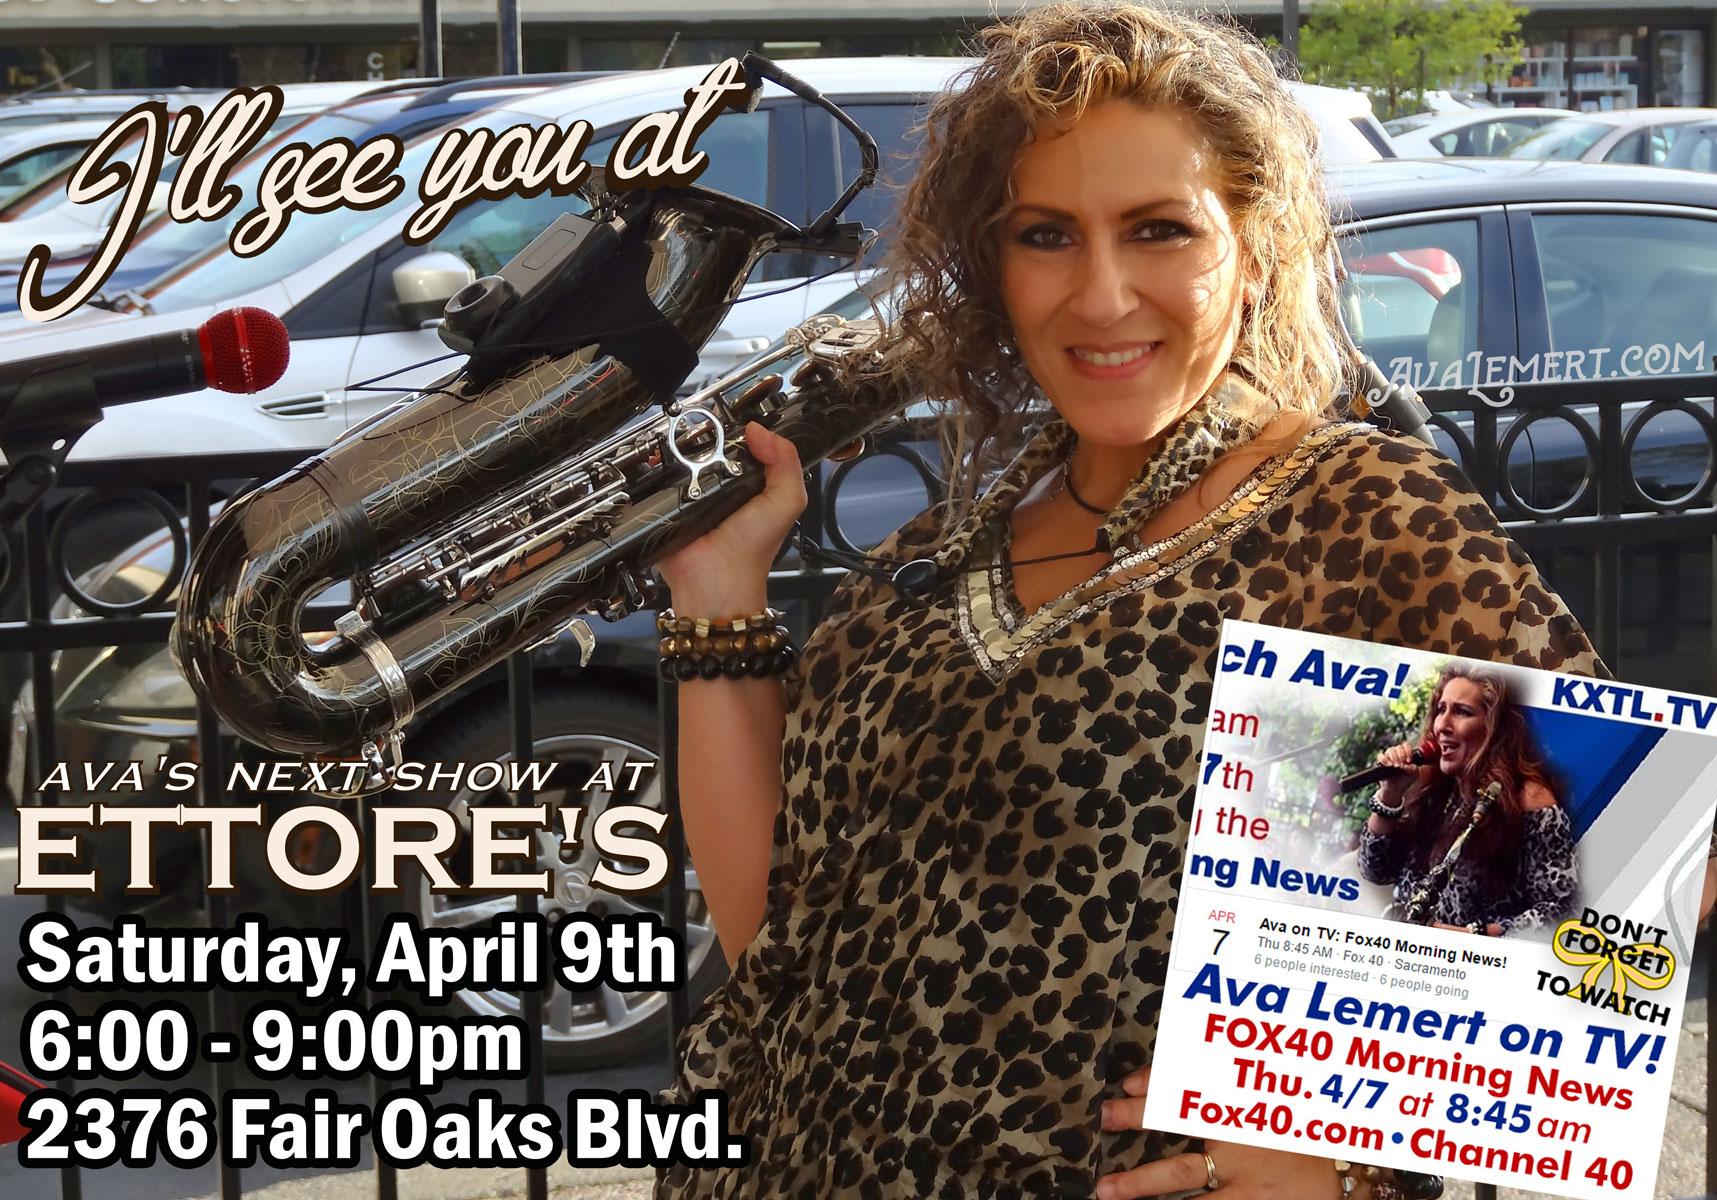 Ava's April at Ettore's Show 4/9 6:30-9pm